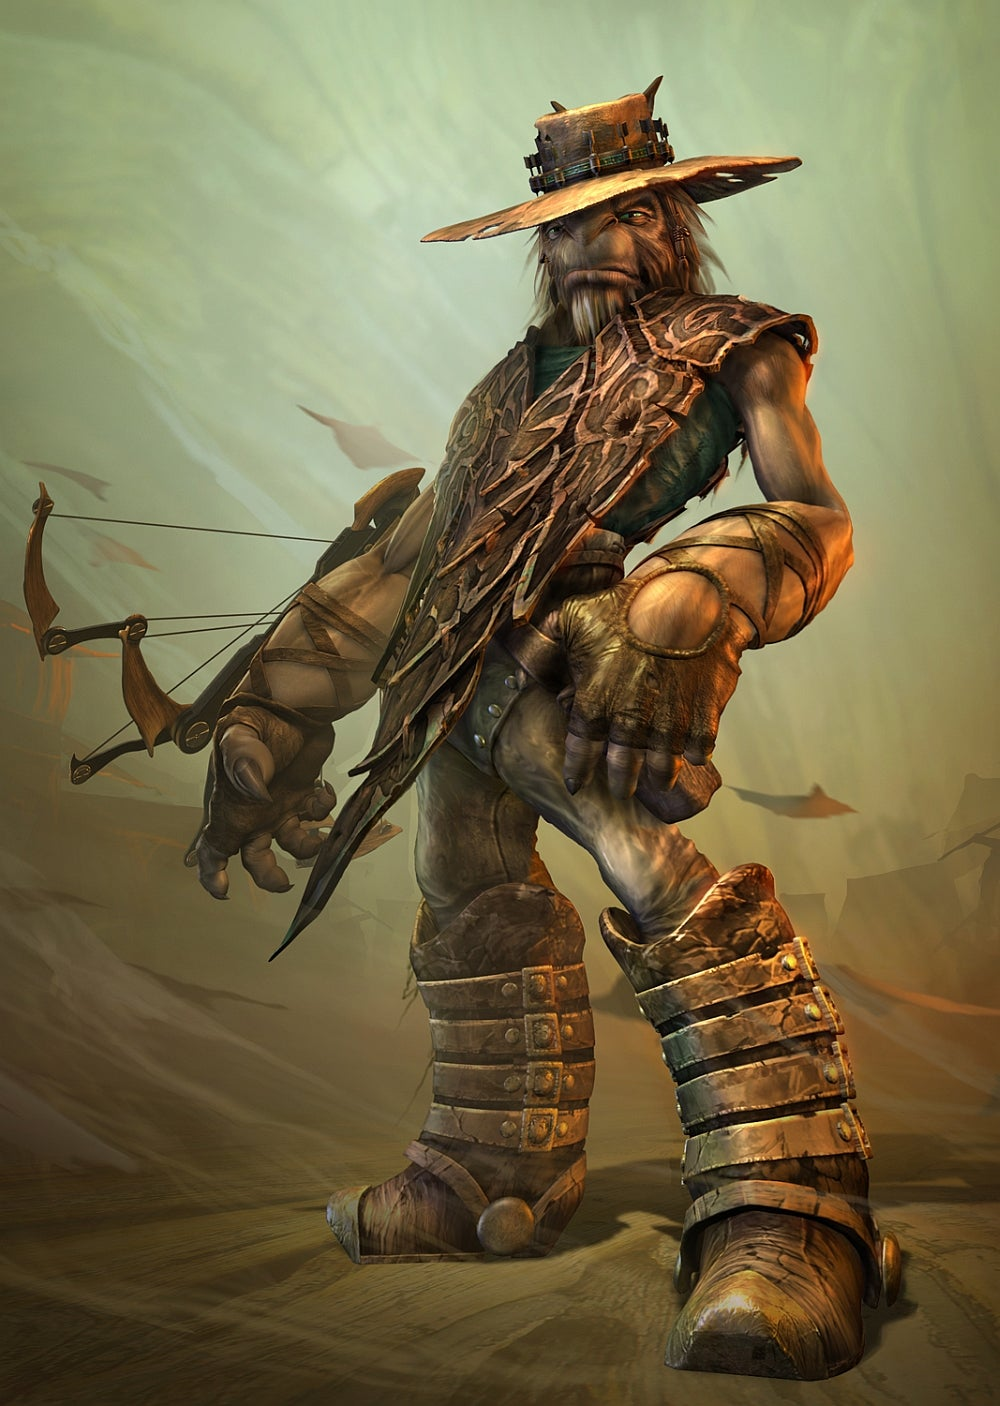 Samurai Wallpaper Iphone 6 Oddworld Stranger S Wrath Playstation 2 Ign